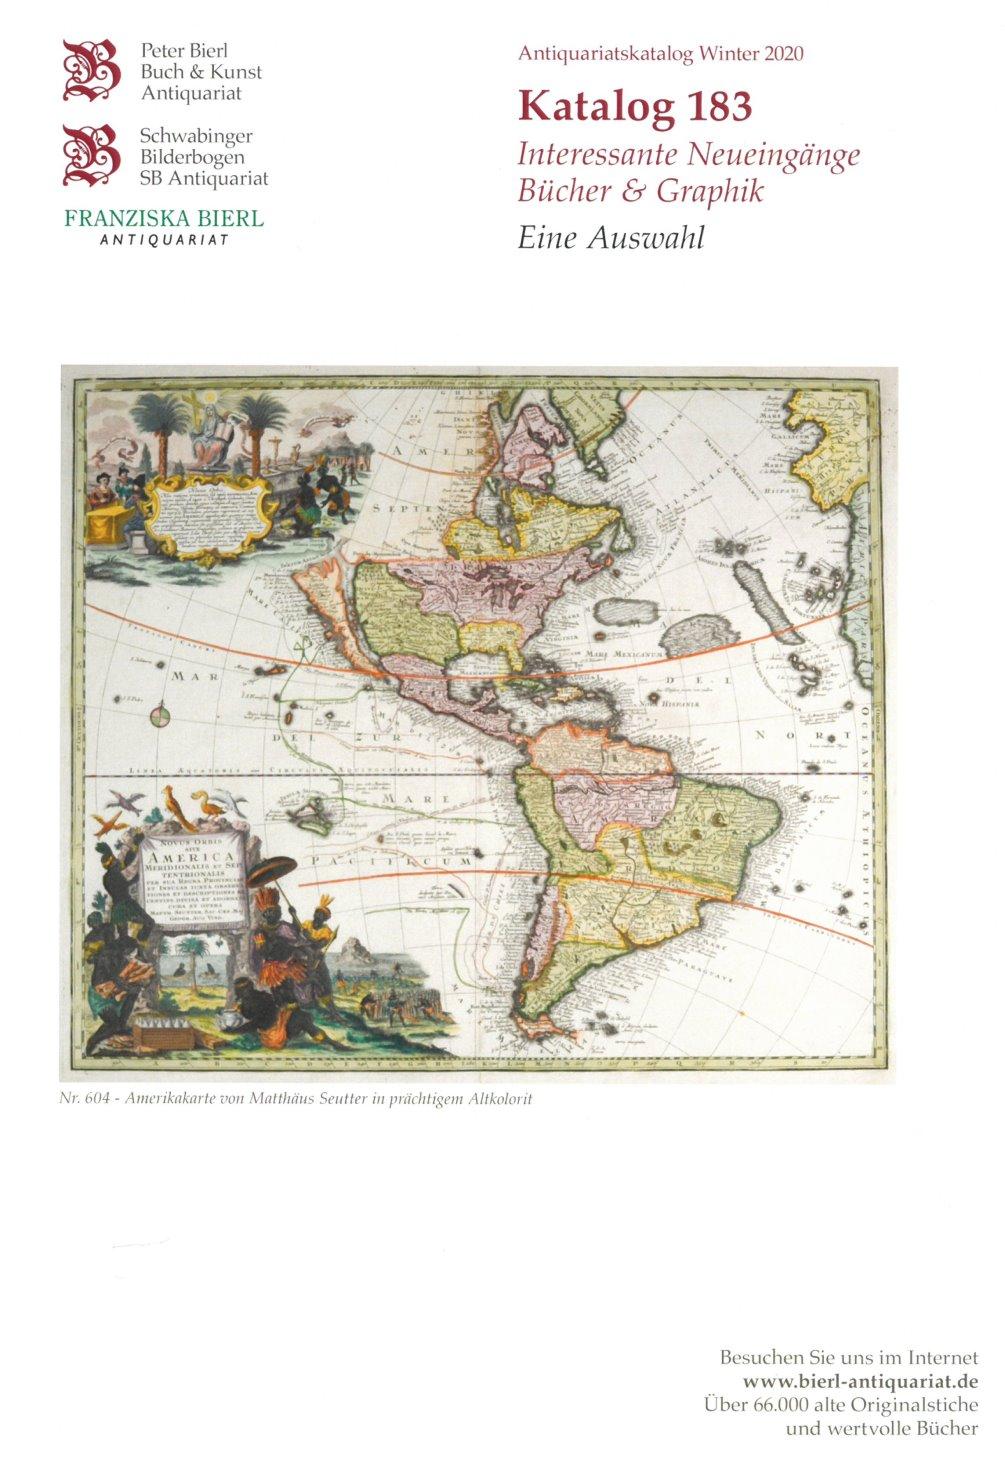 Katalog 183 - Interessante Neueingänge